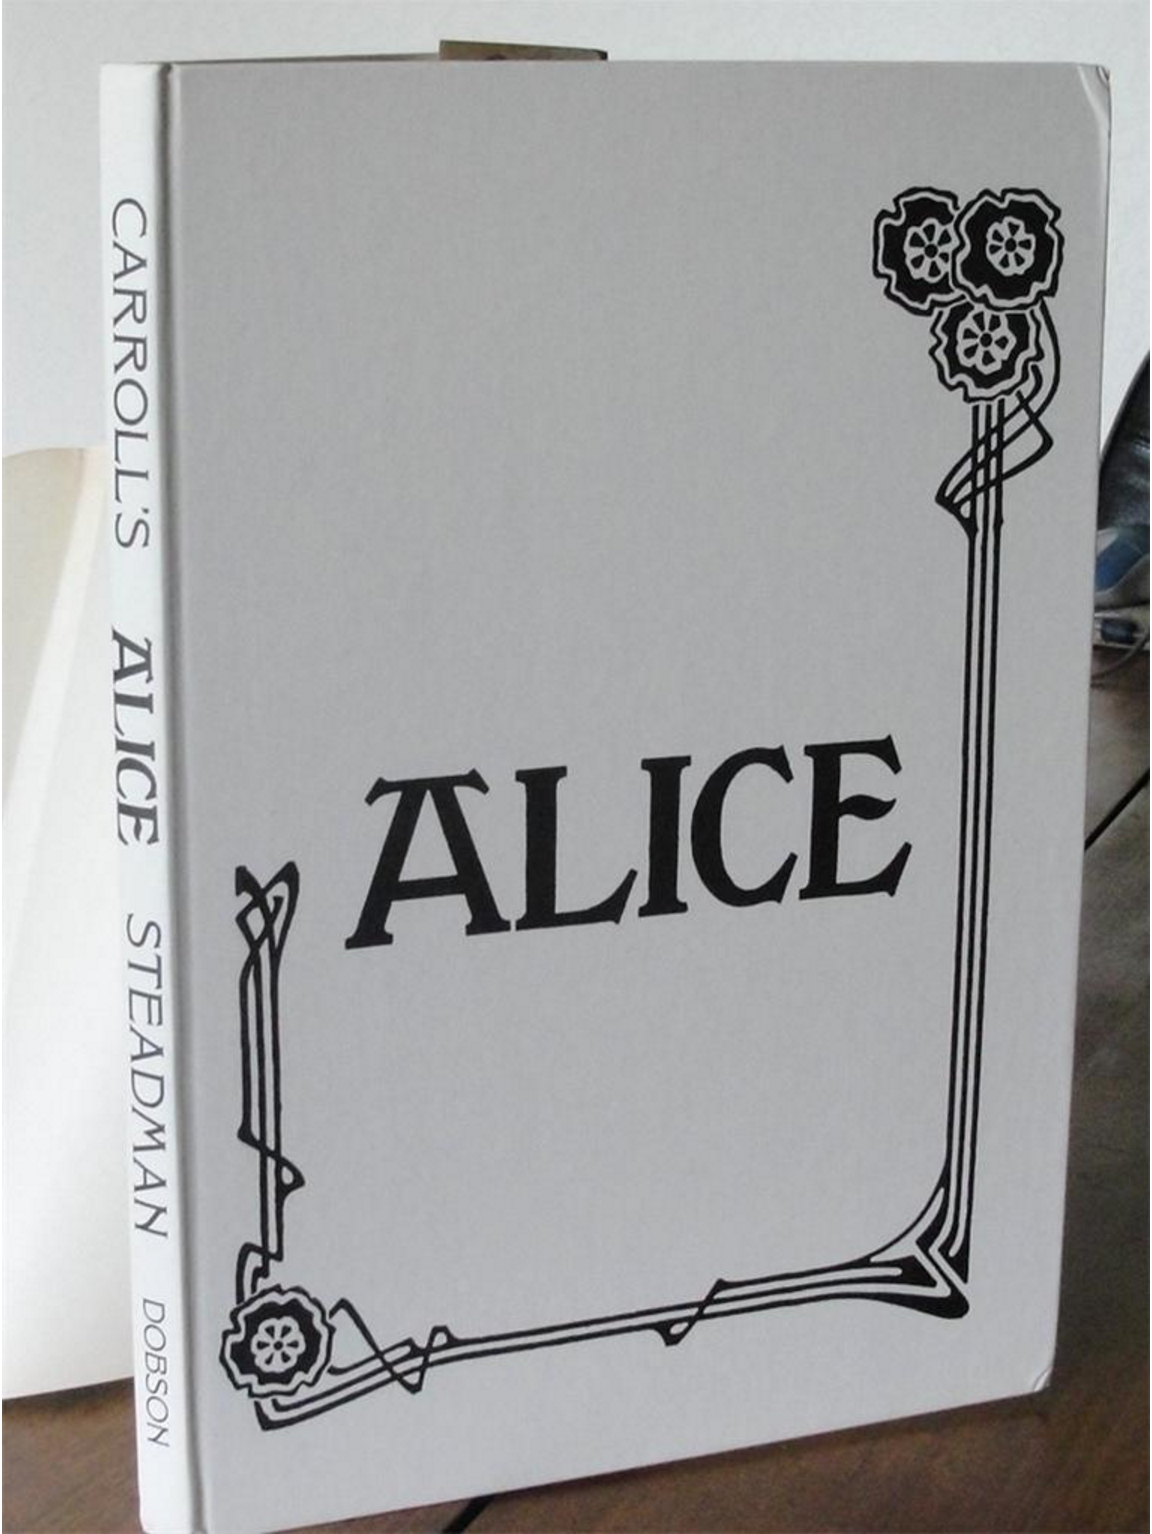 alice in wonderland 10 //6 cardomain parts